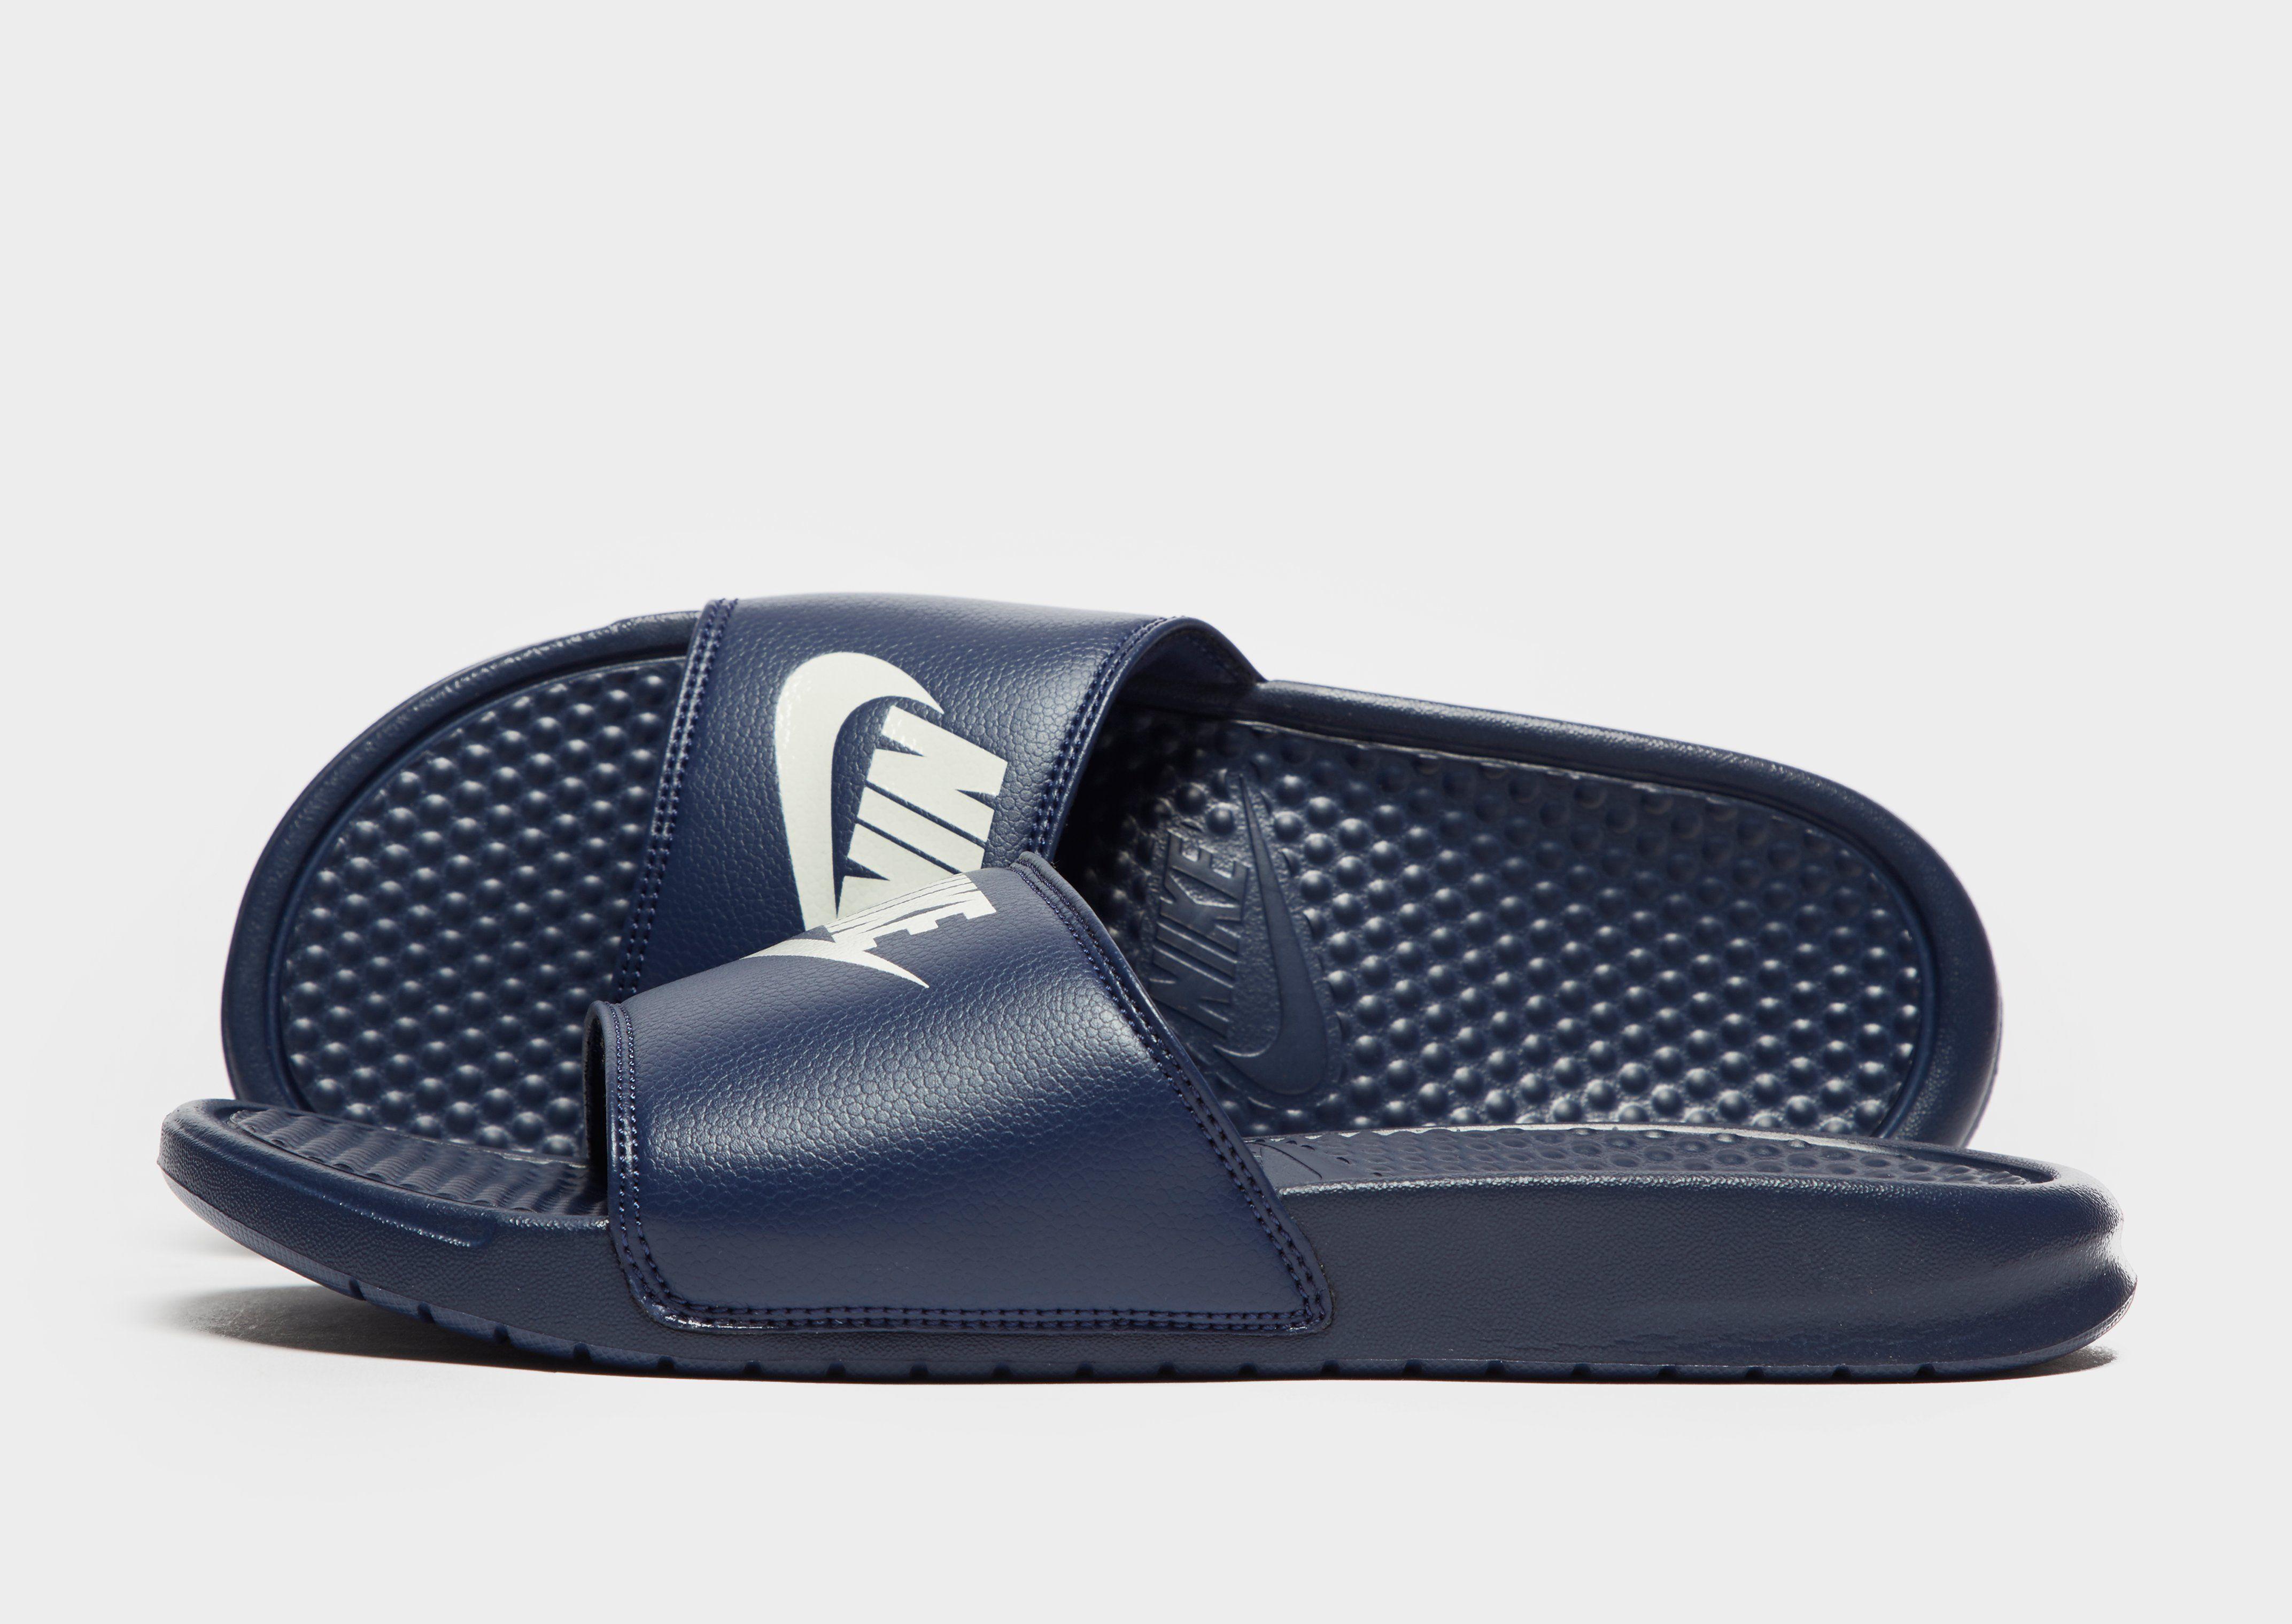 c5b6783c318d Nike Benassi Just Do It Slides